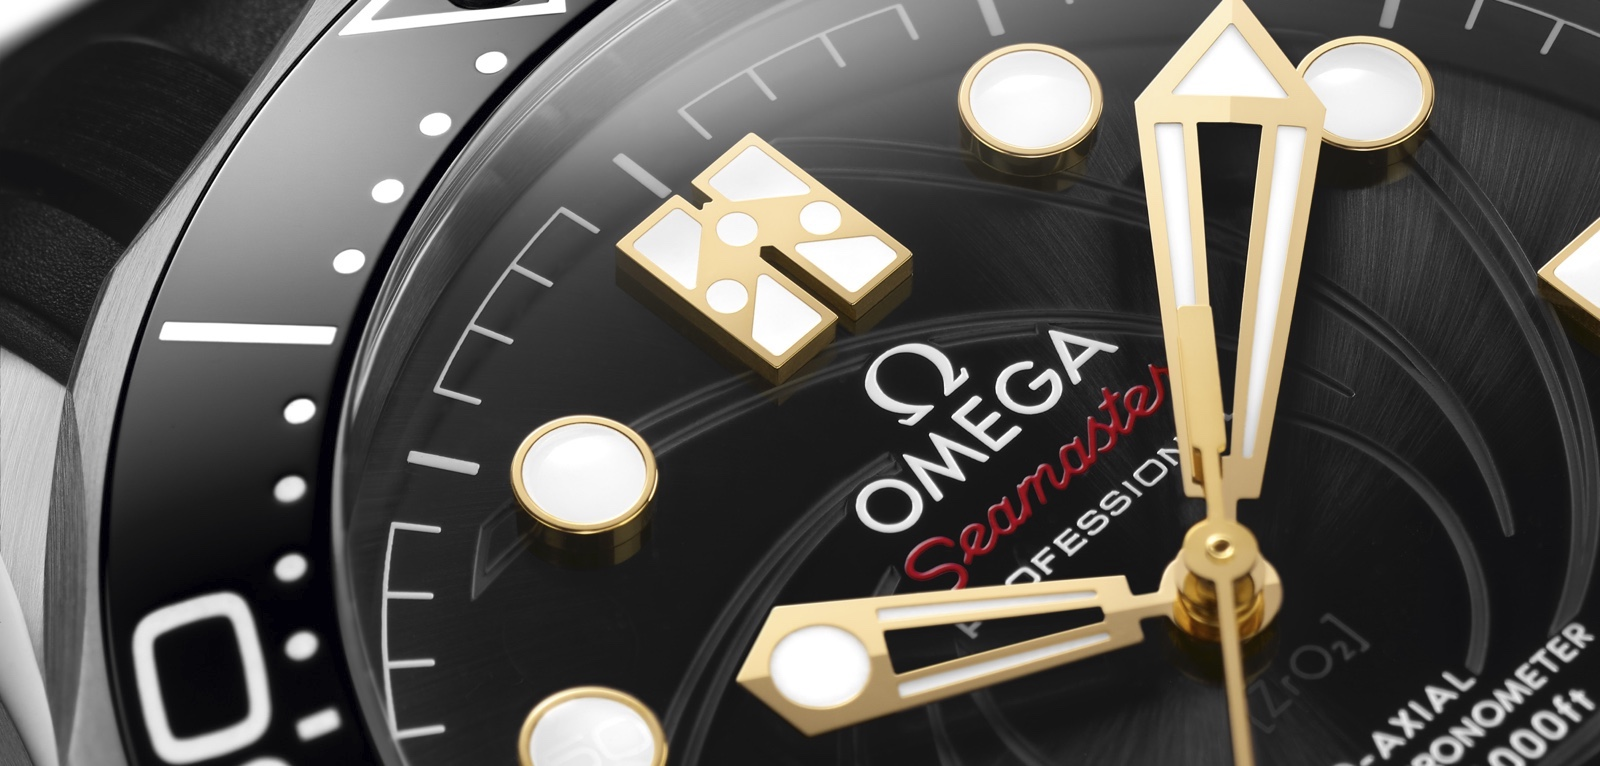 Omega Seamaster Diver 300M James Bond Limited Edition Cover